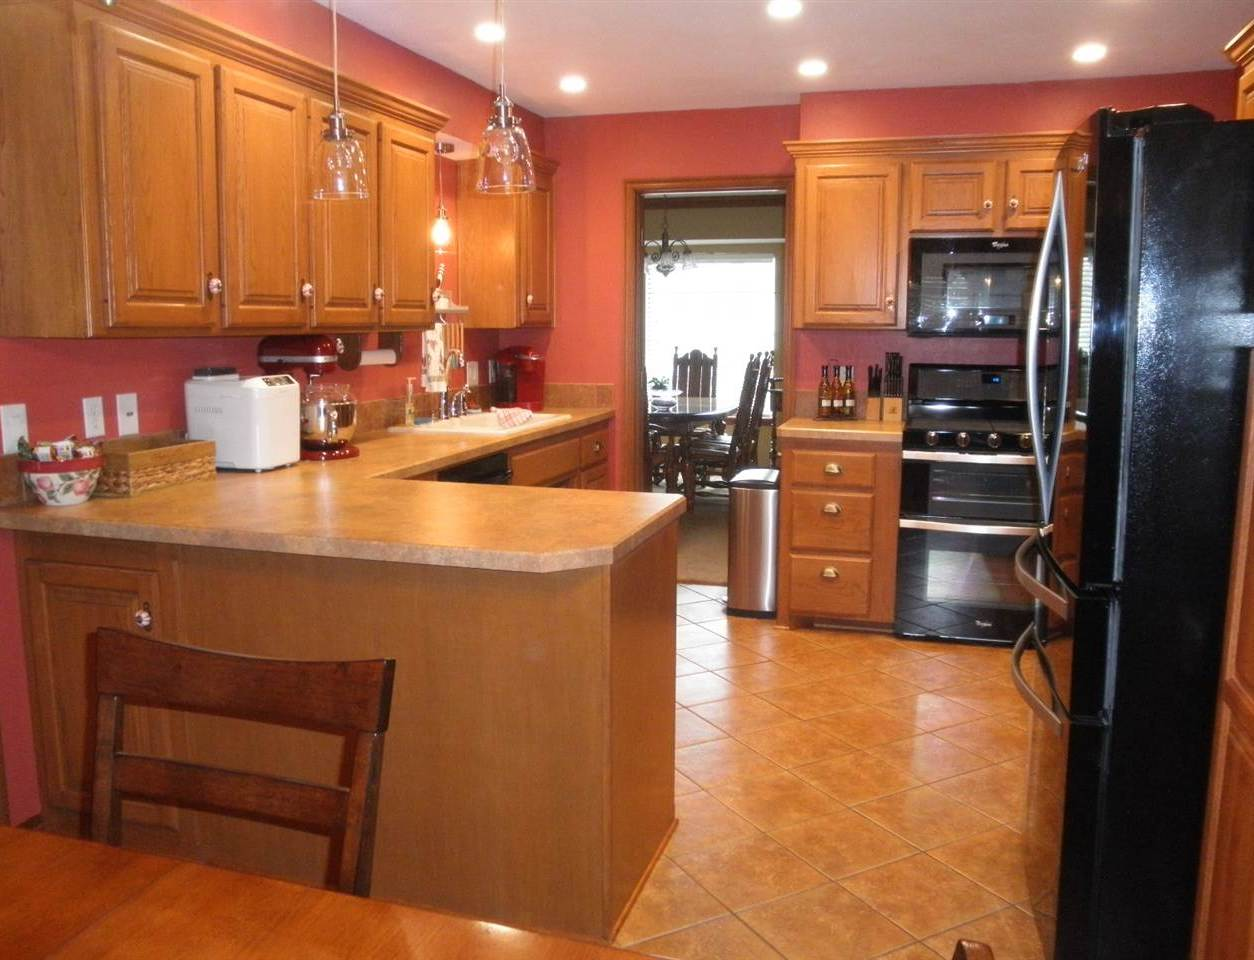 Sold Intraoffice W/MLS | 2800 Green Meadow Ponca City, OK 74604 7